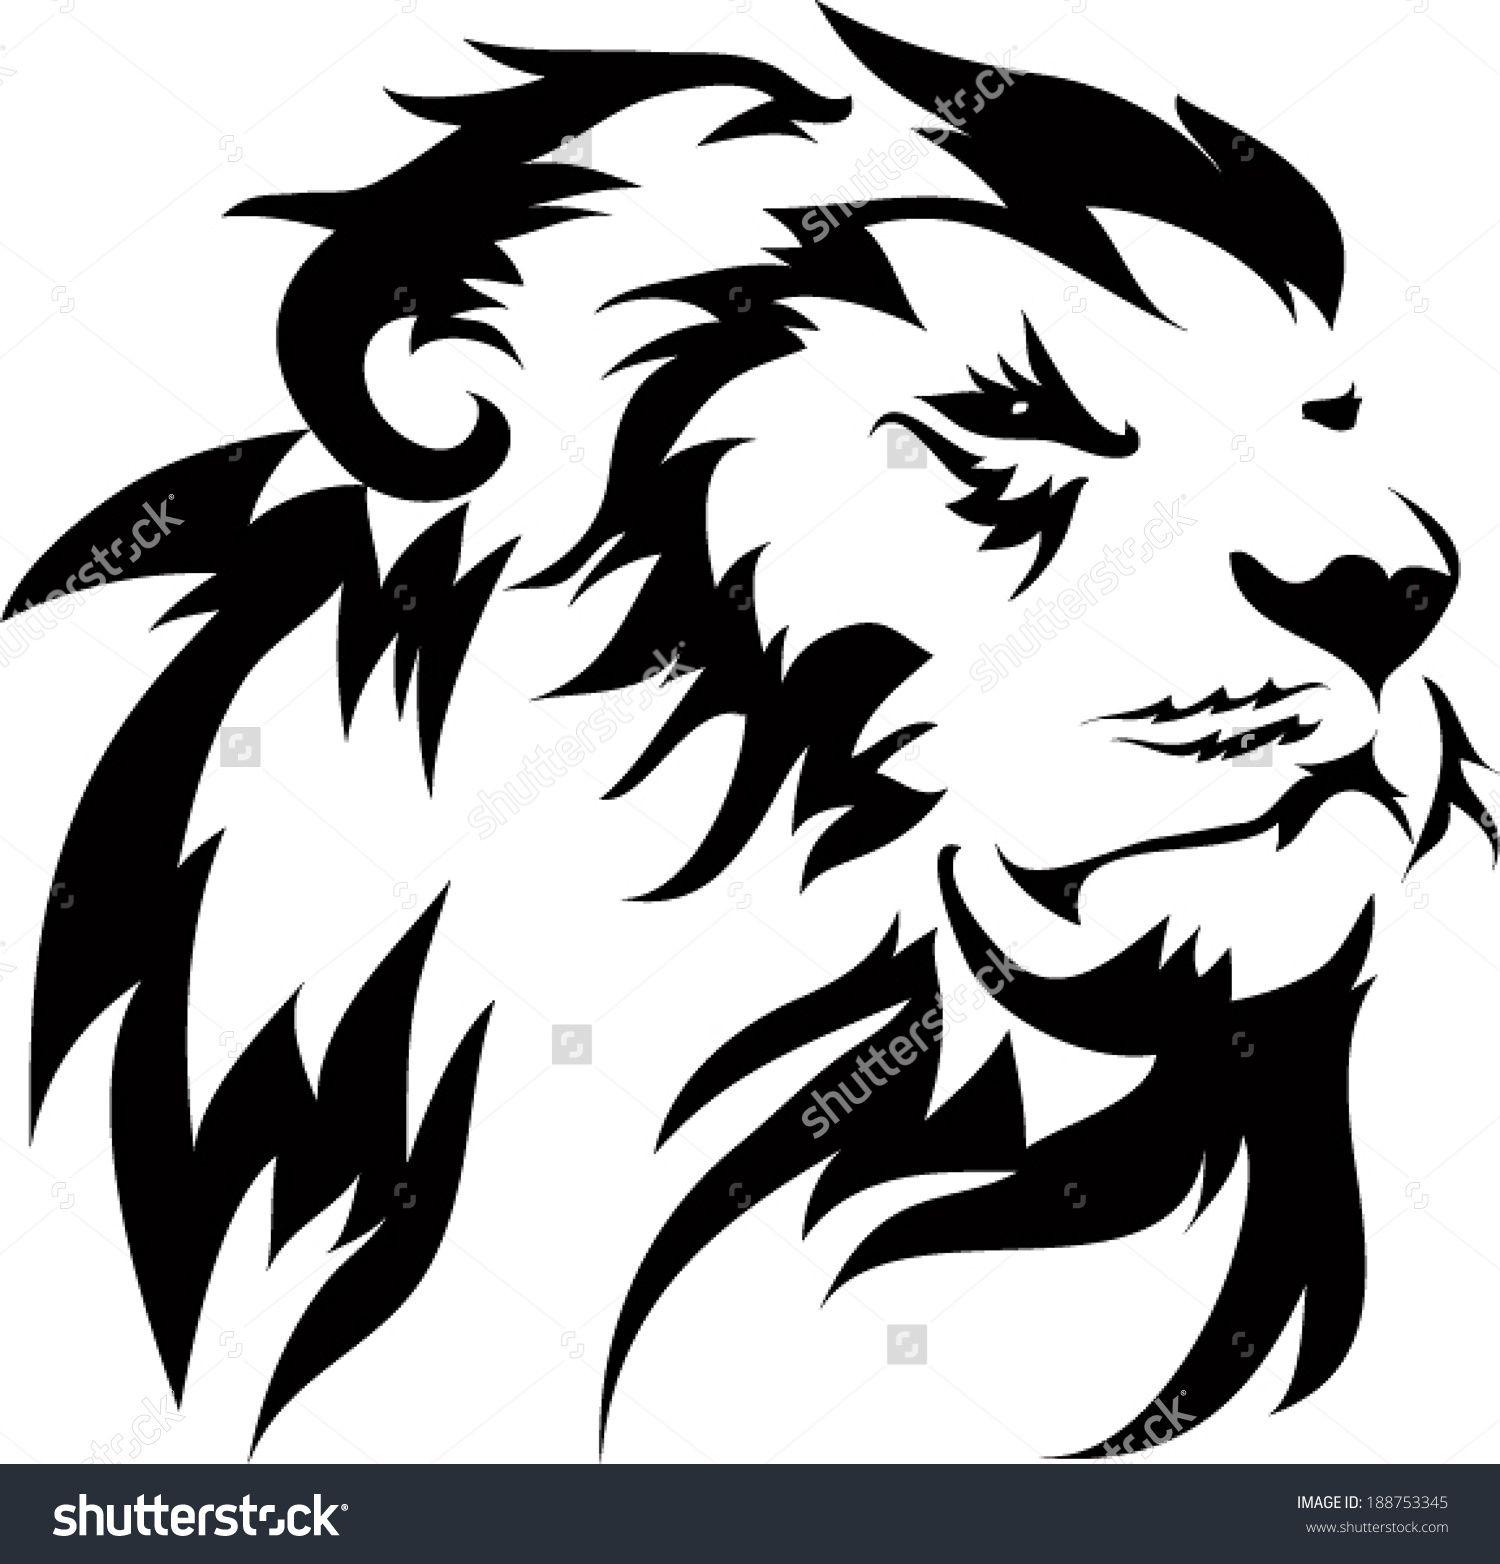 lion tattoo 3d eye - Пошук Google   tattoo ideas   Pinterest